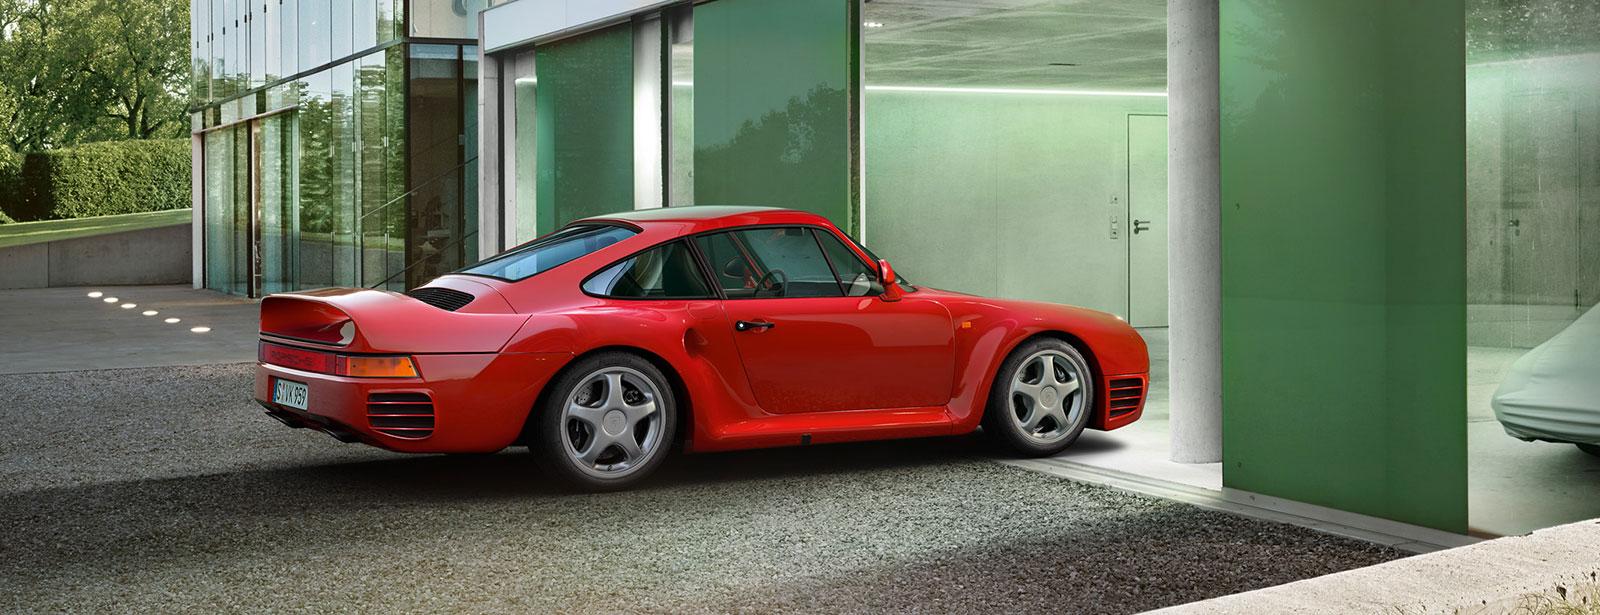 Porsche Classic Veranstaltungen